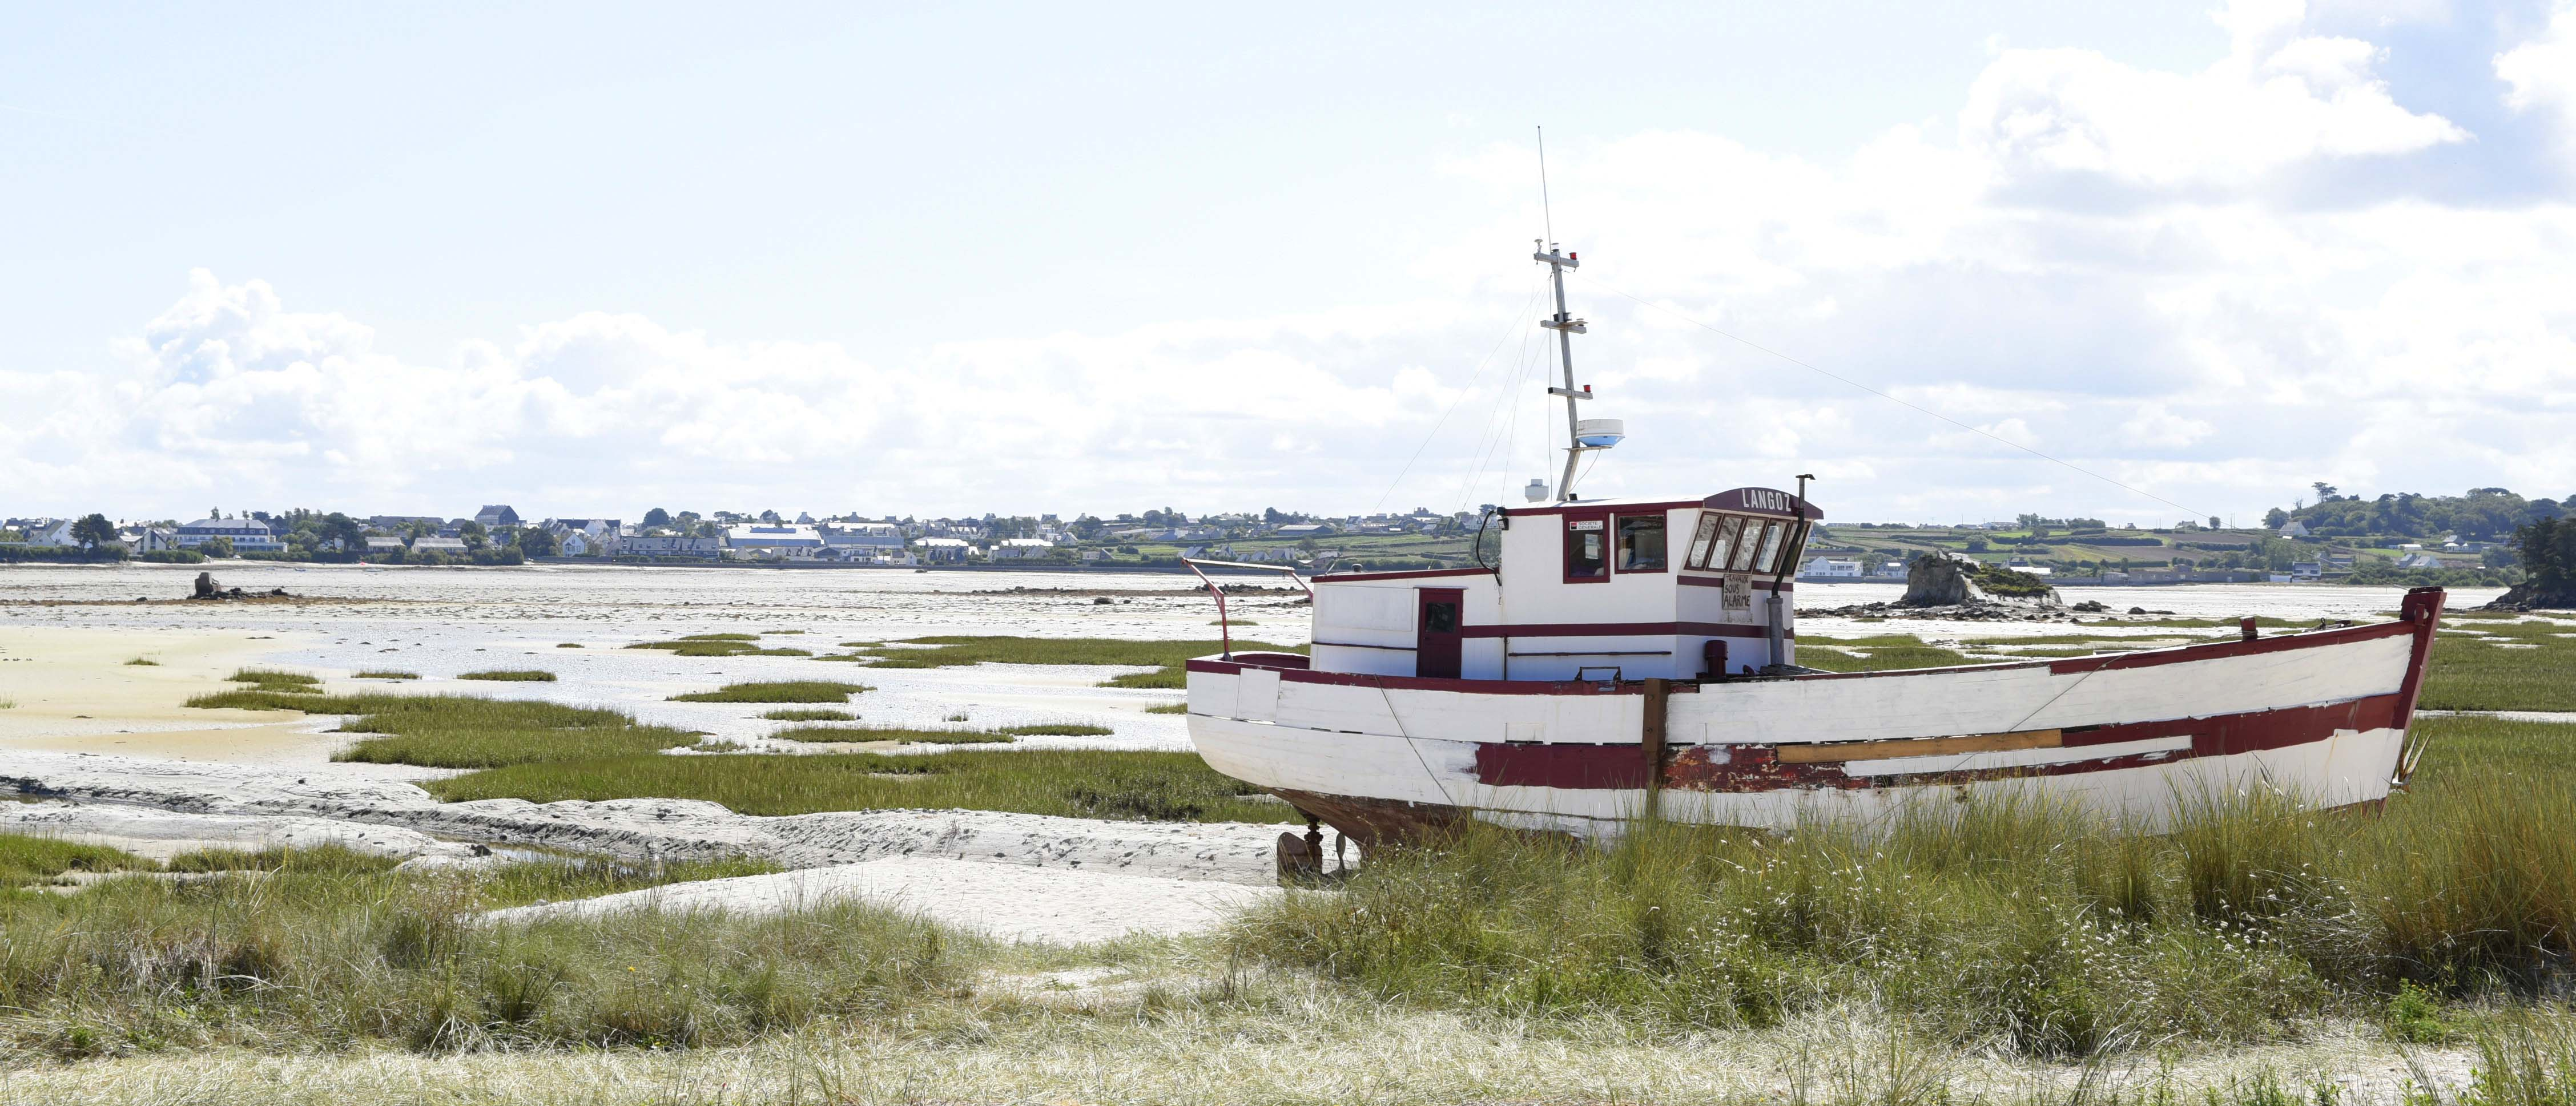 bateau-Baie-de-Morlaix